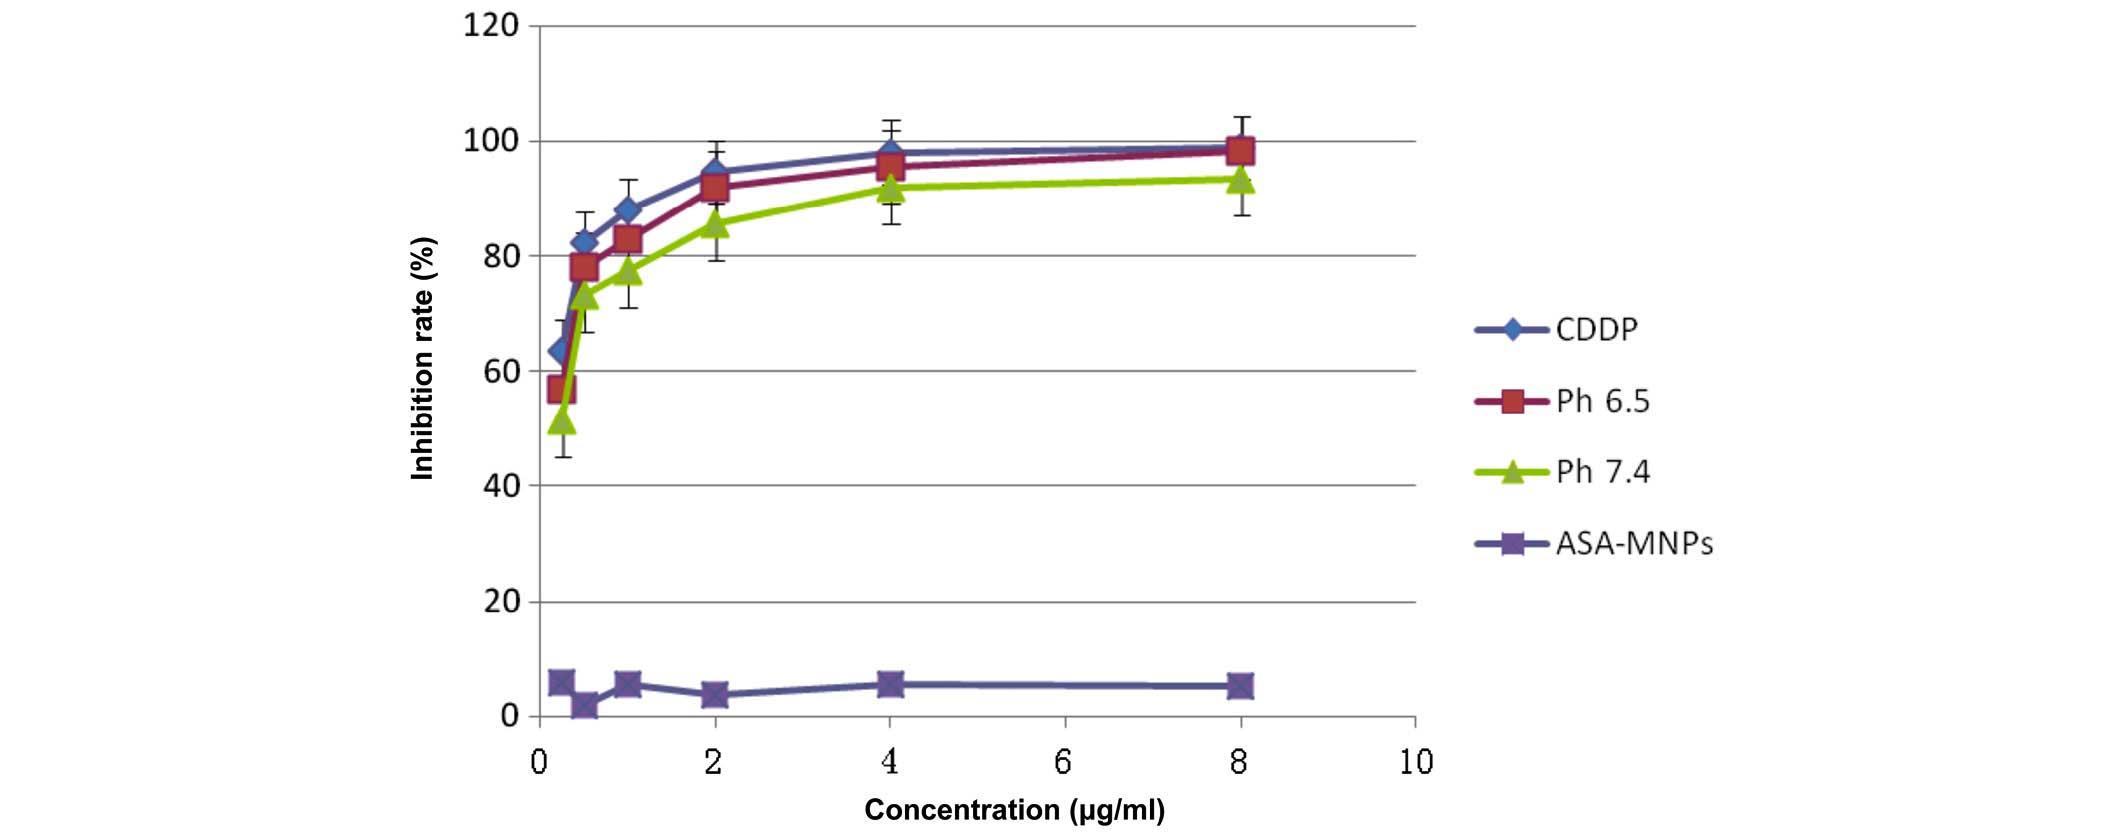 Preparation and performance of a pH-sensitive cisplatin-loaded